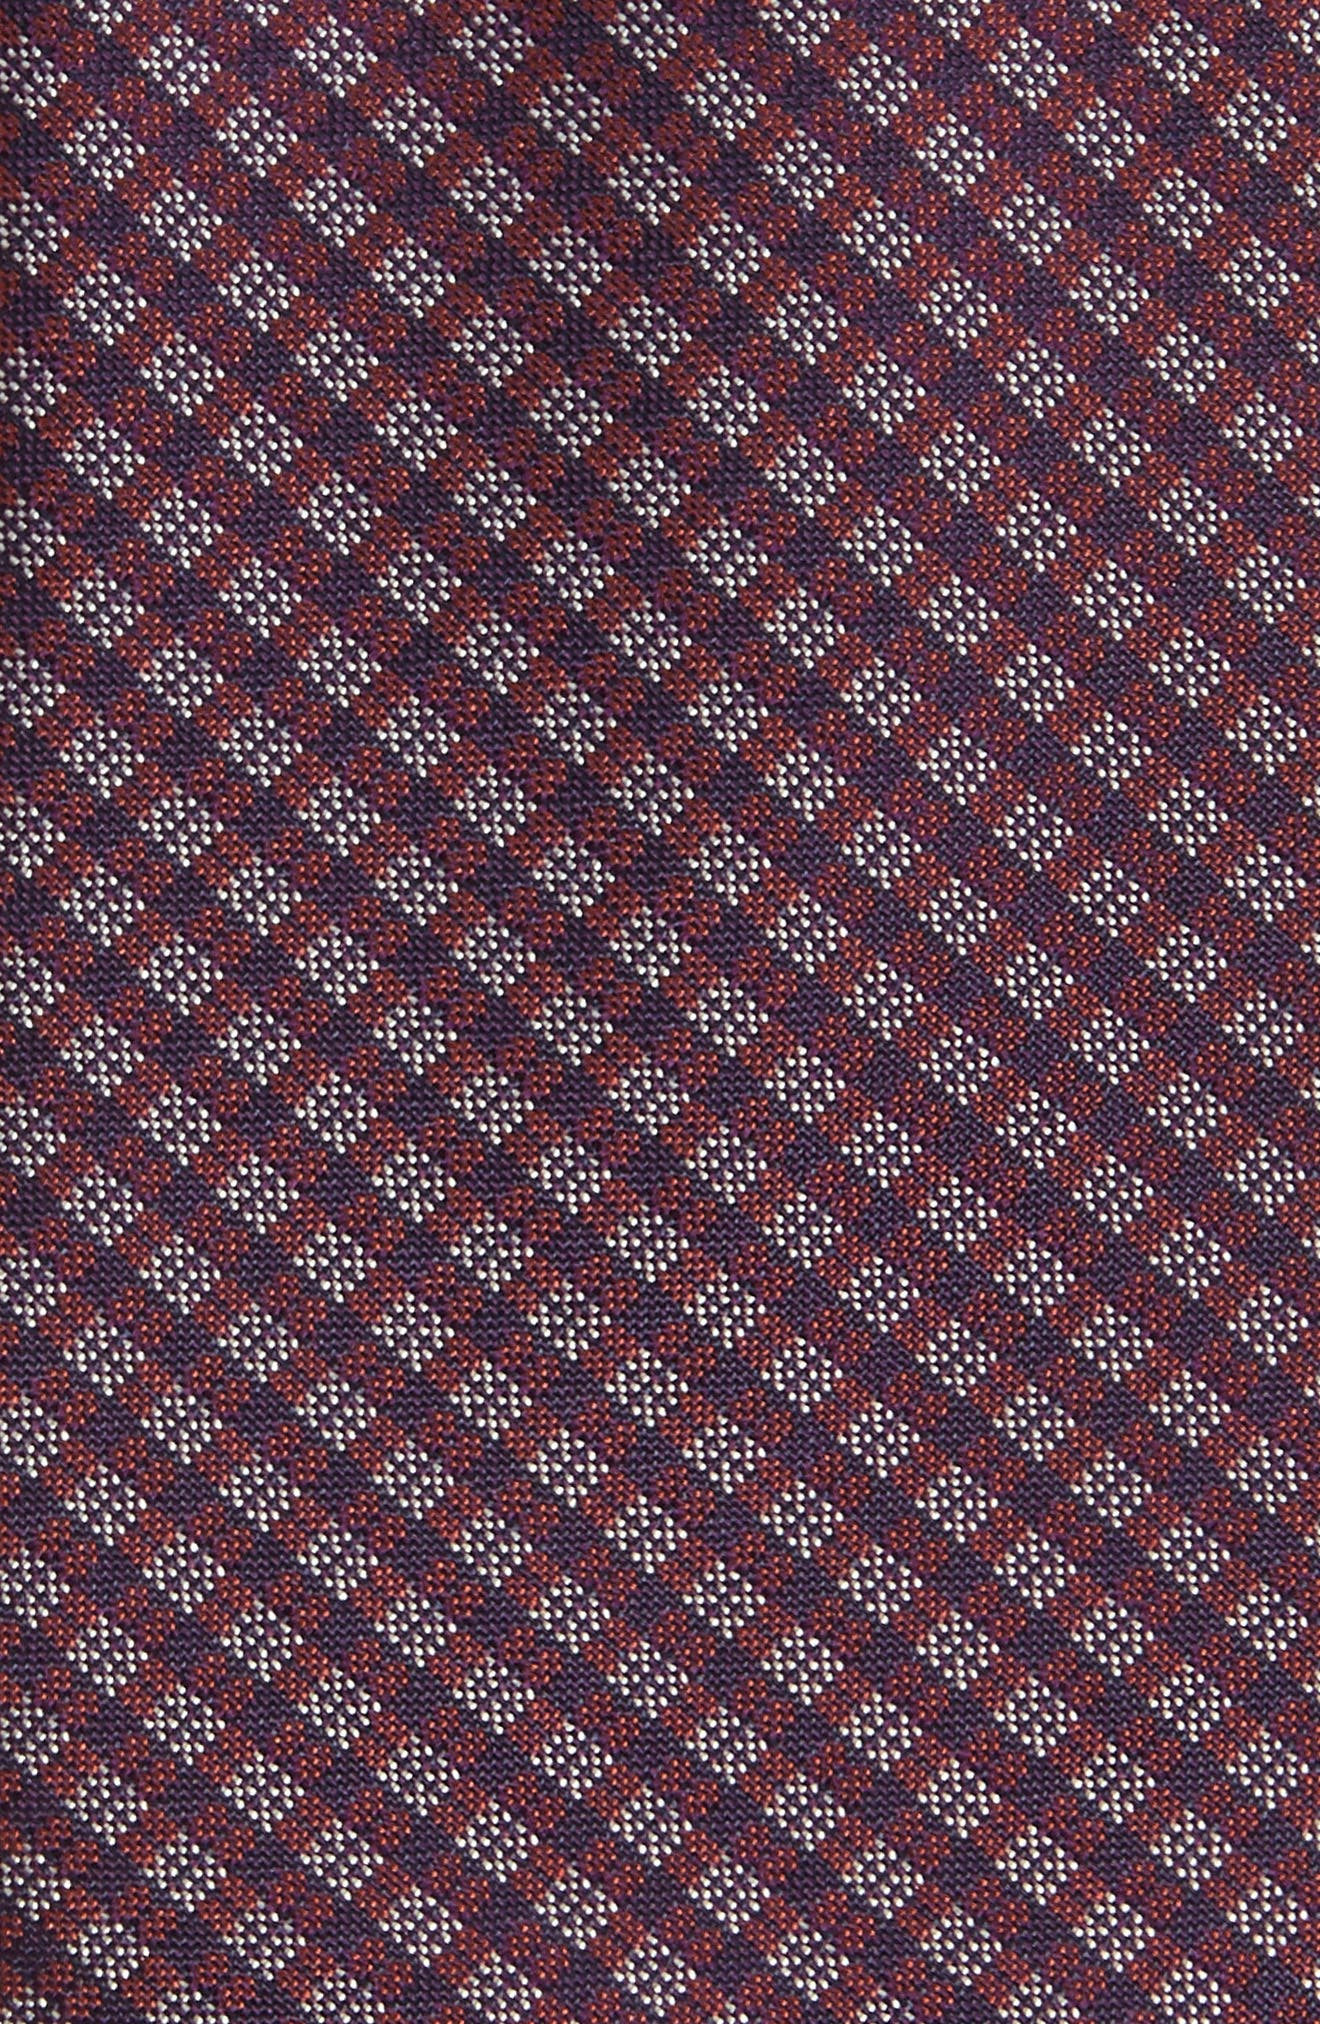 Microcheck Silk Tie,                             Alternate thumbnail 2, color,                             225